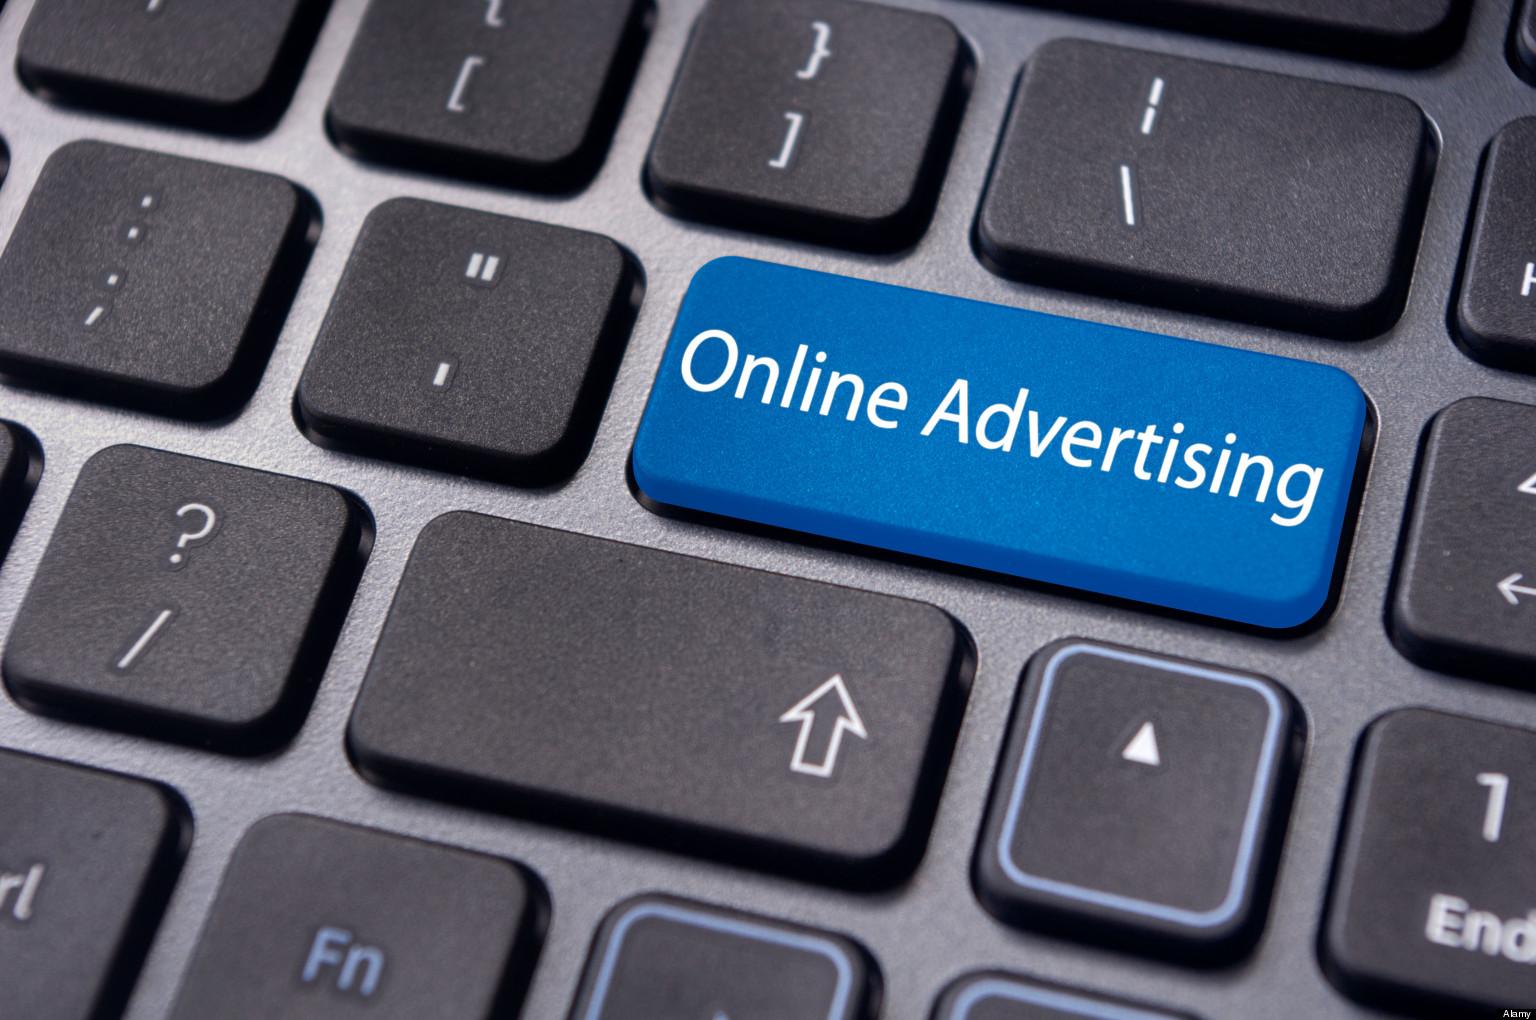 Online Advertising 4/1